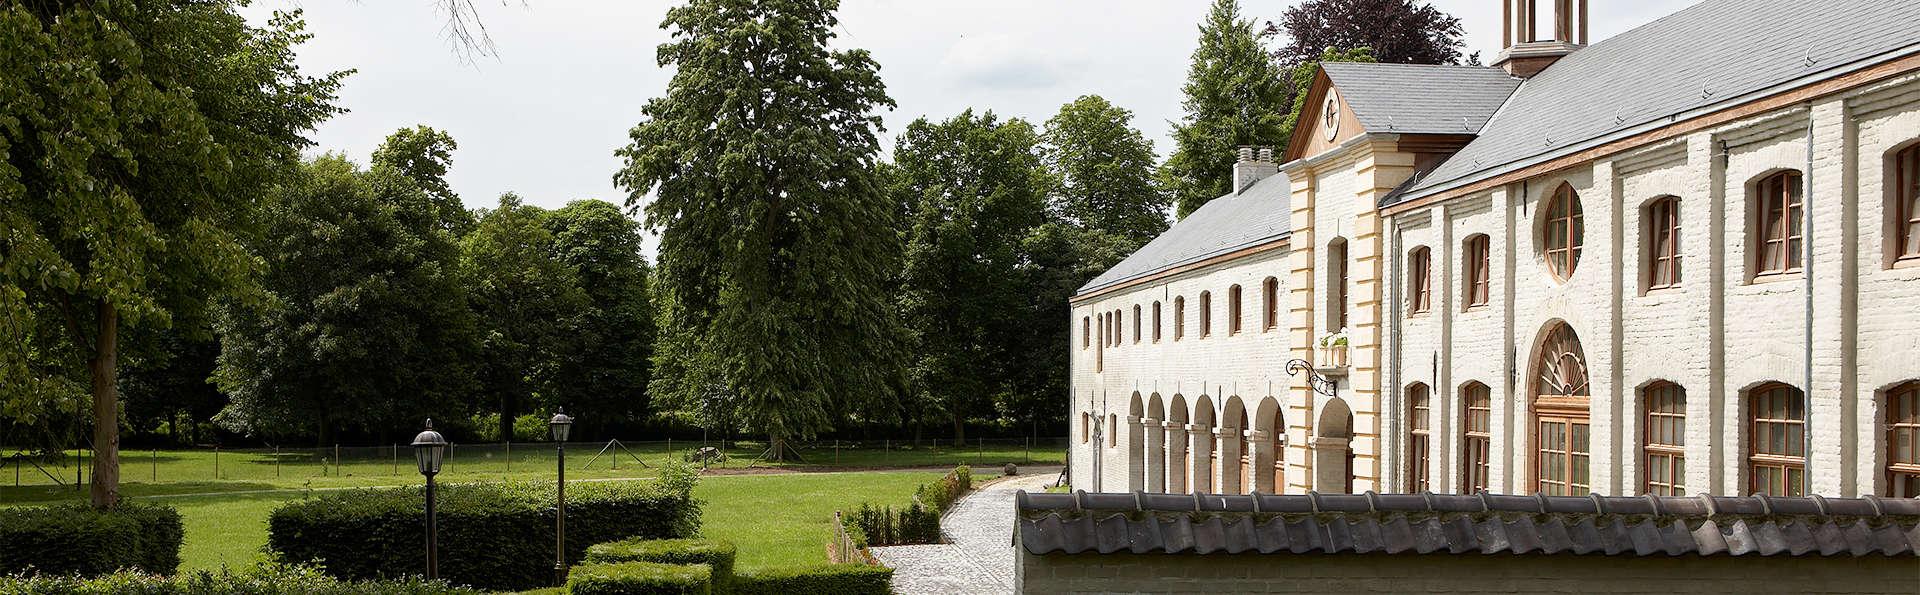 B&B Baron's House Neerijse-Leuven - EDIT_front2.jpg